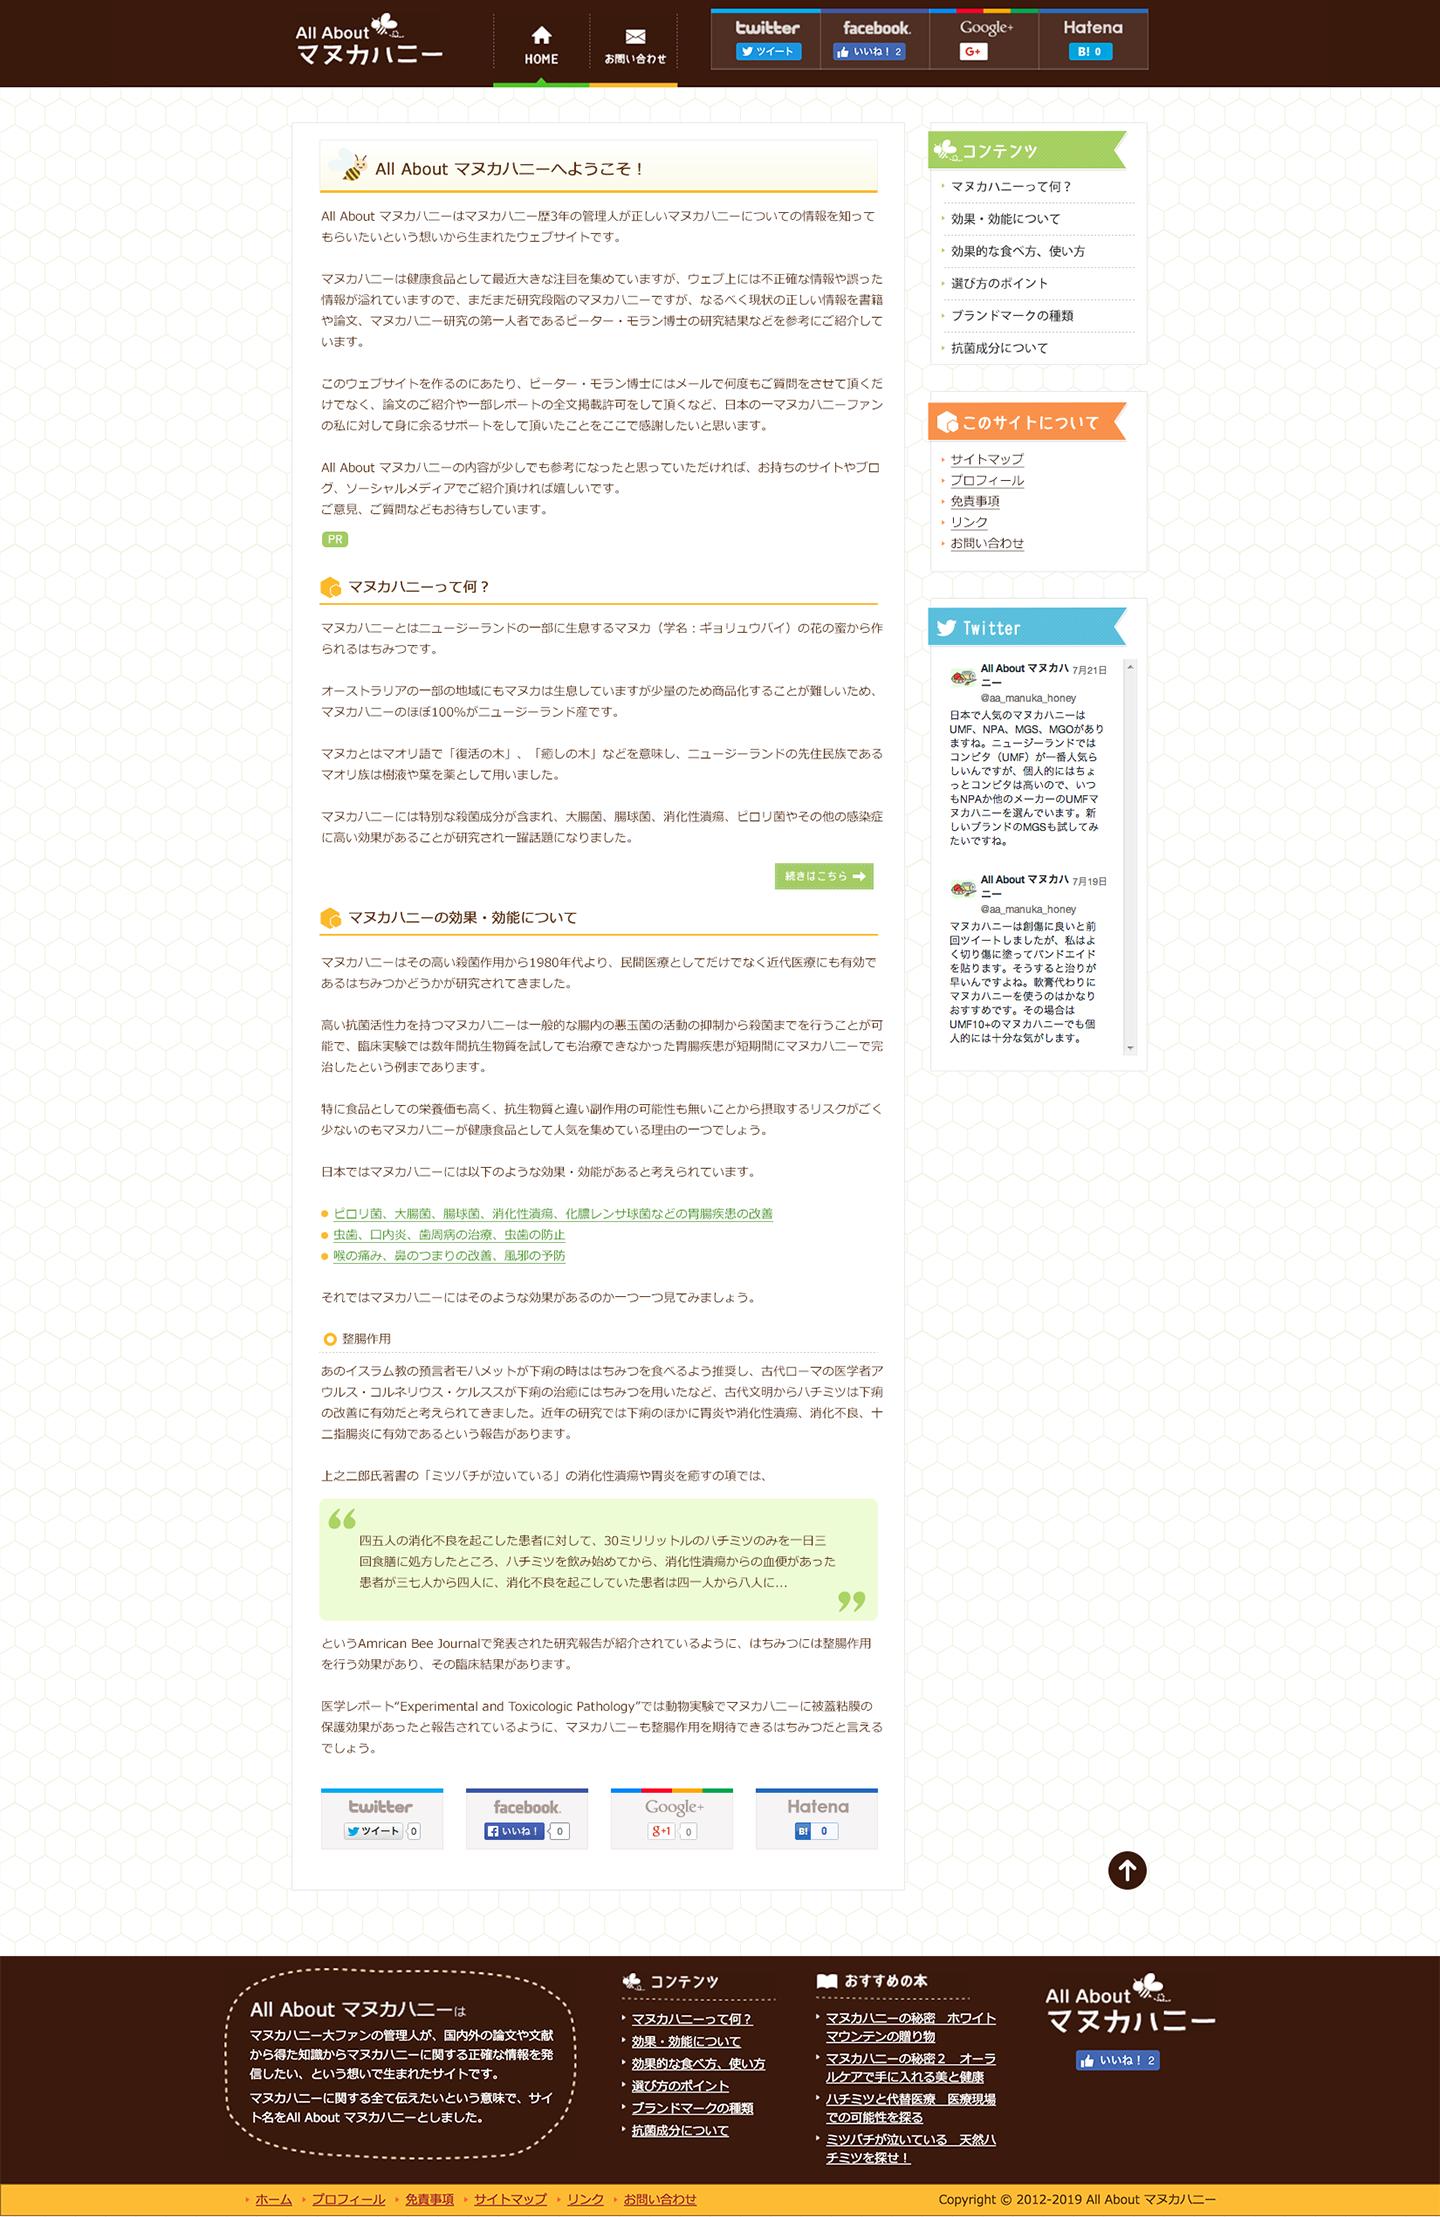 All About マヌカハニーさまのWebサイトデザイン